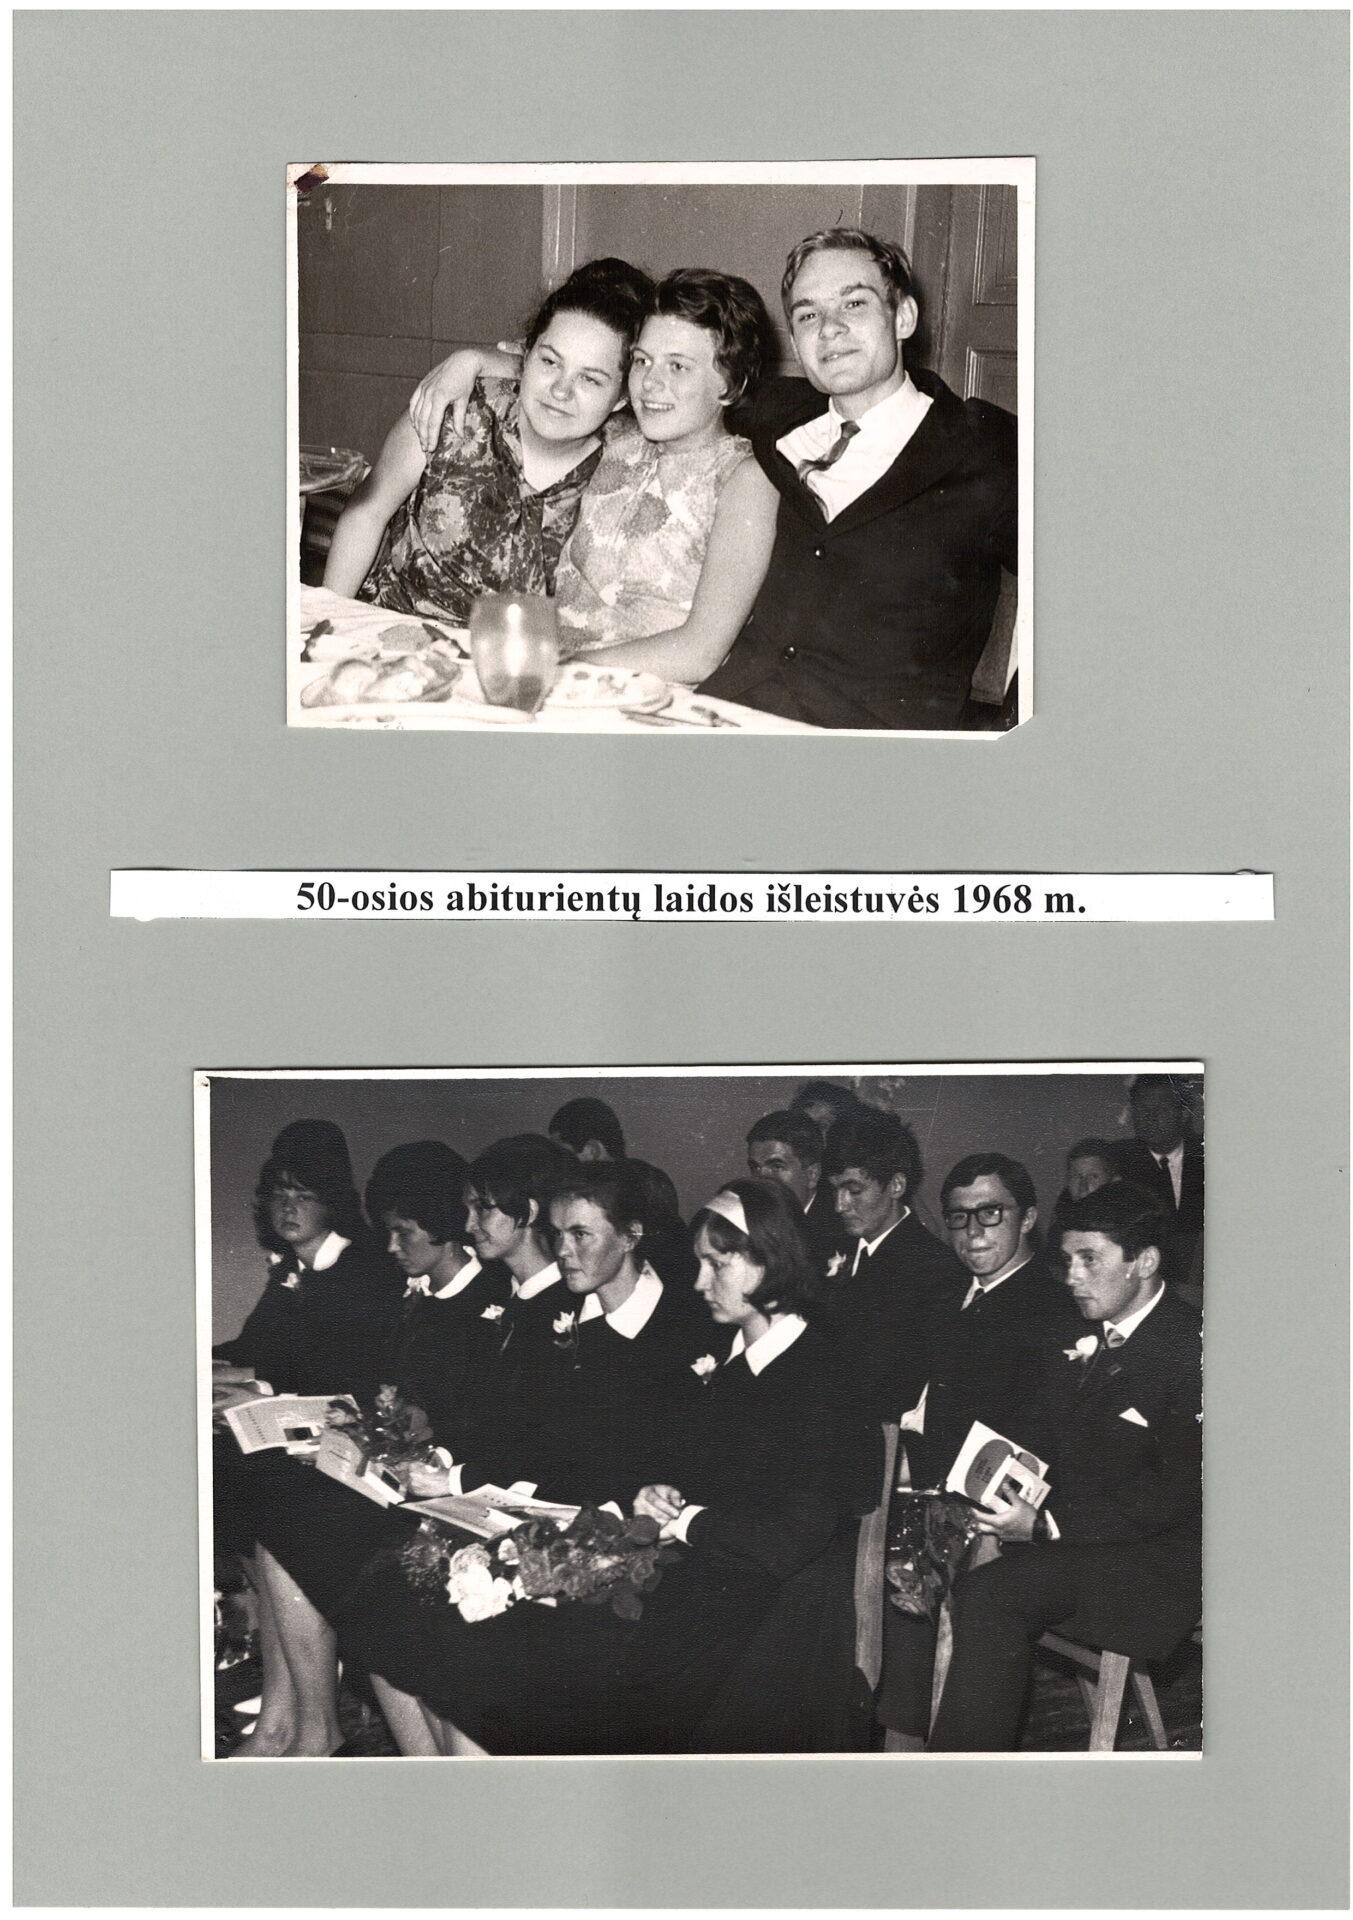 50-os laidos išleistuvės